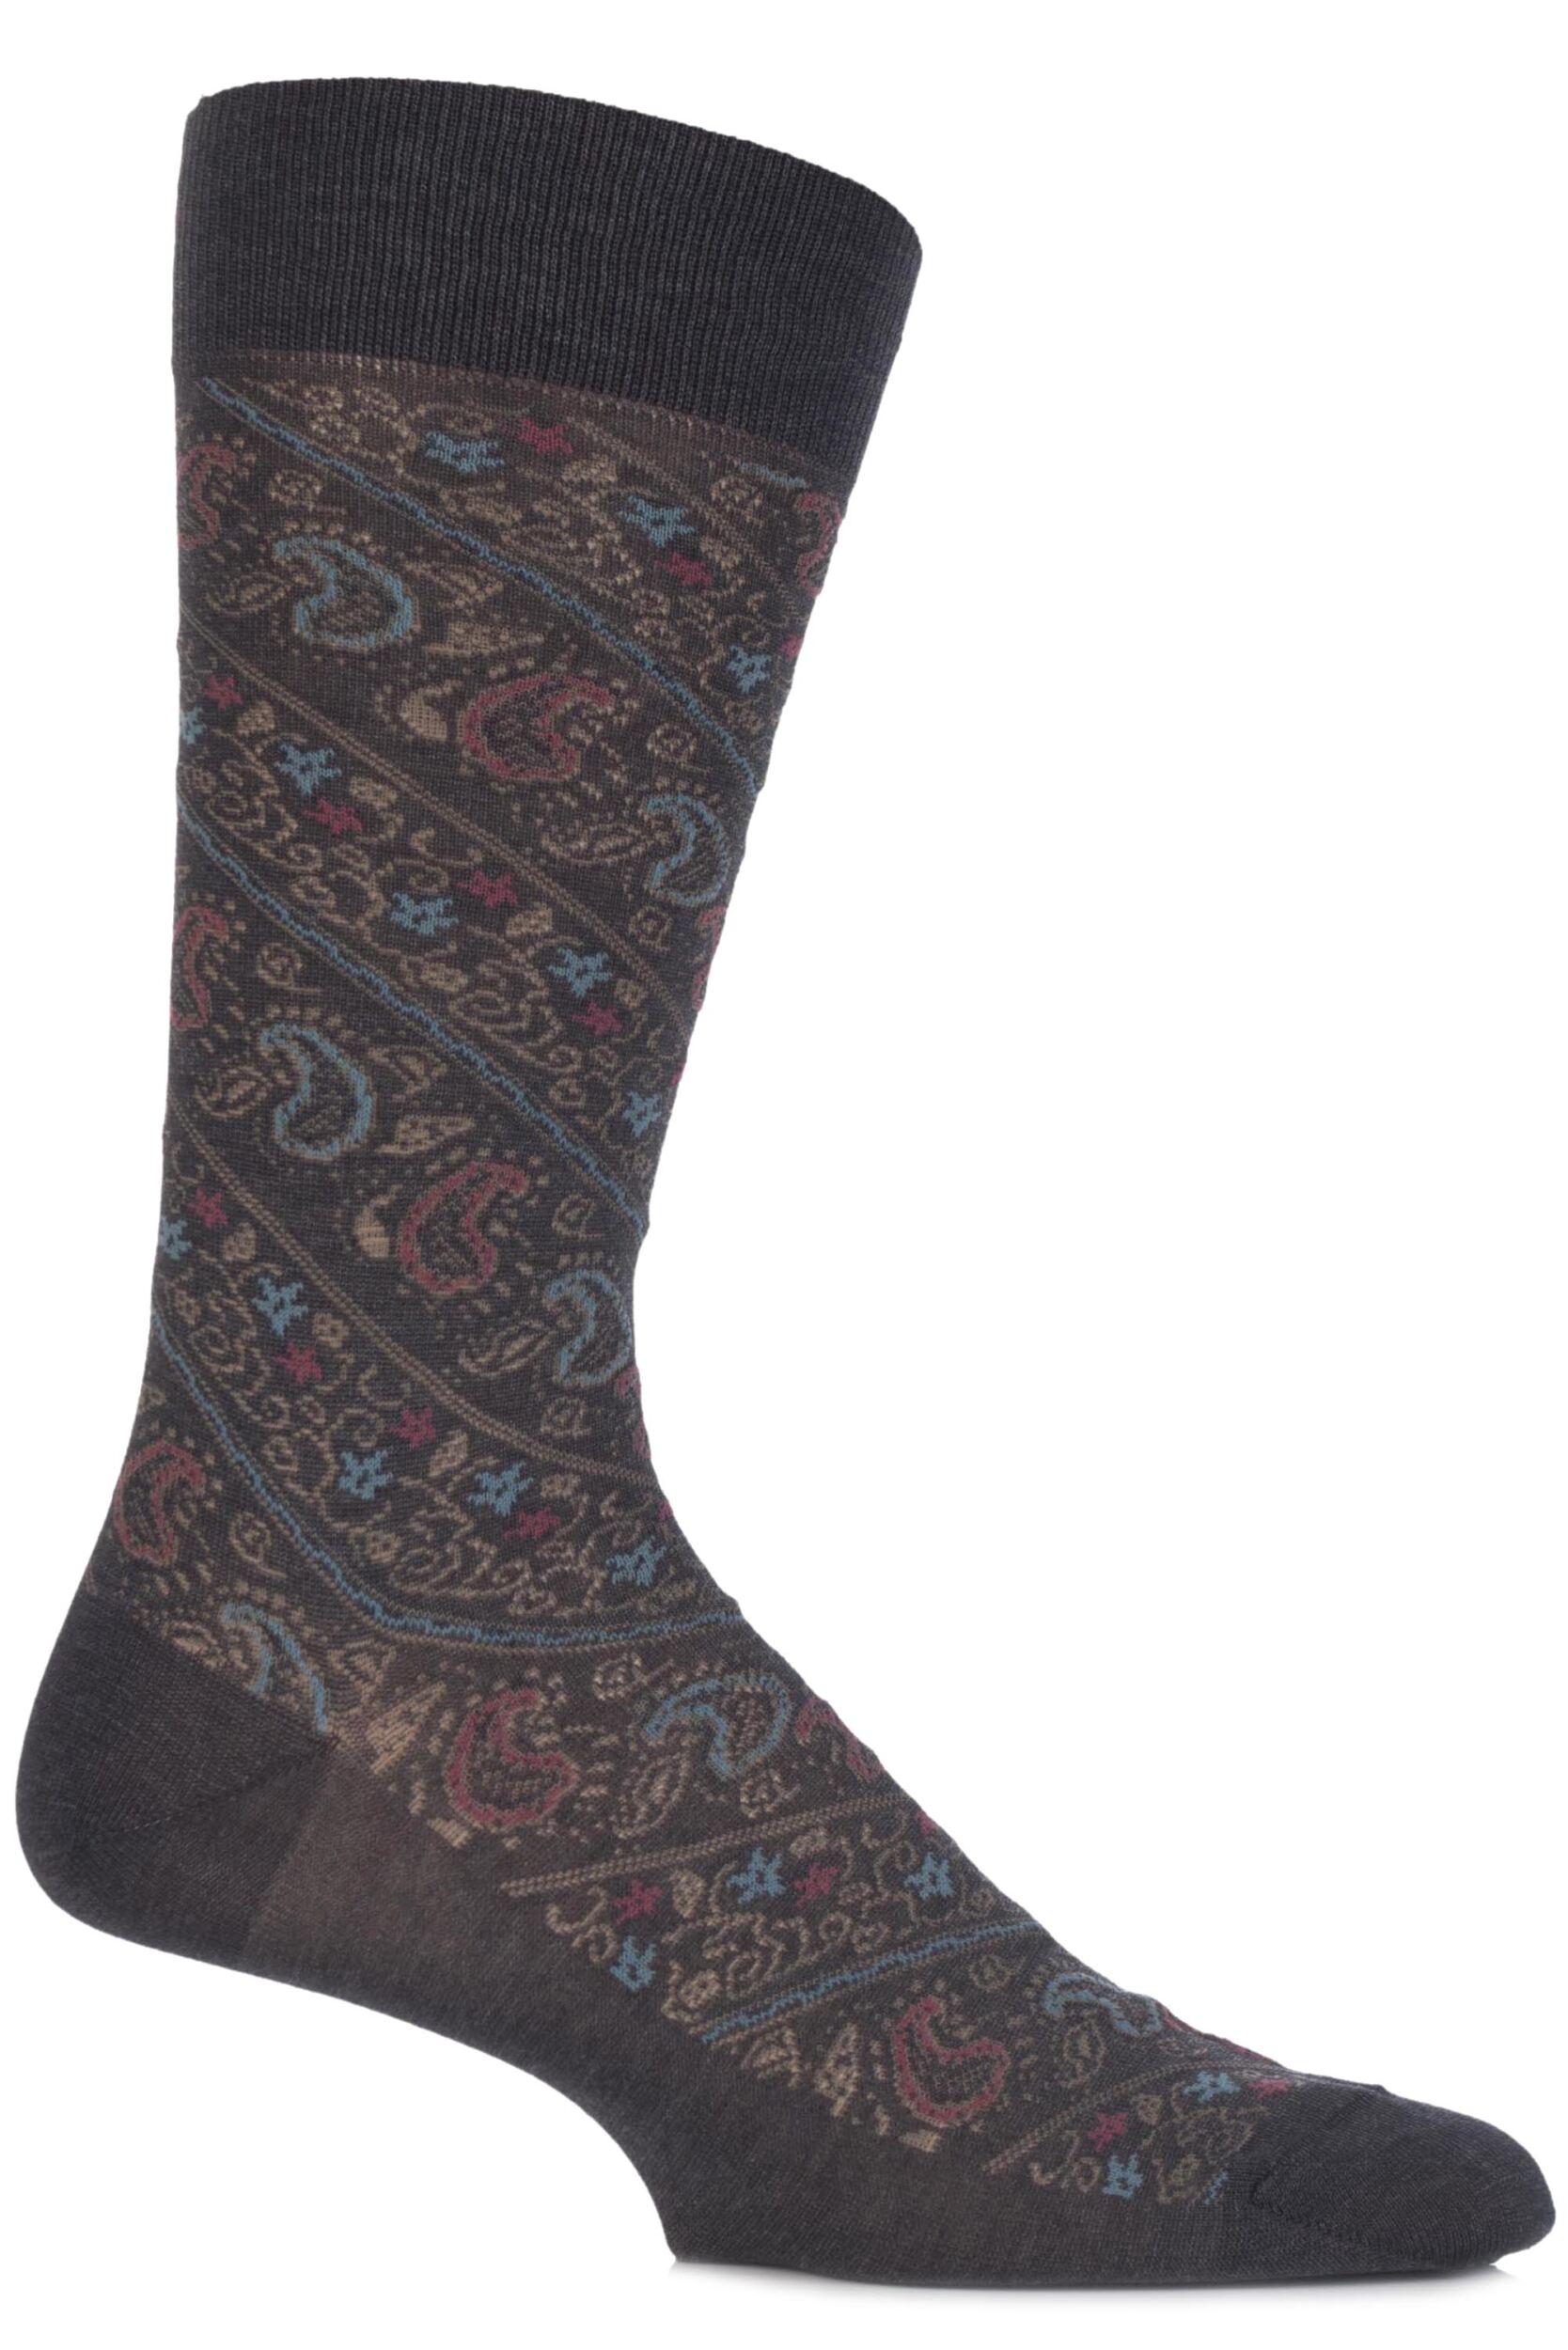 Men's Socks Mens 1 Pair Pantherella Vintage Allover Paisley Cotton Socks